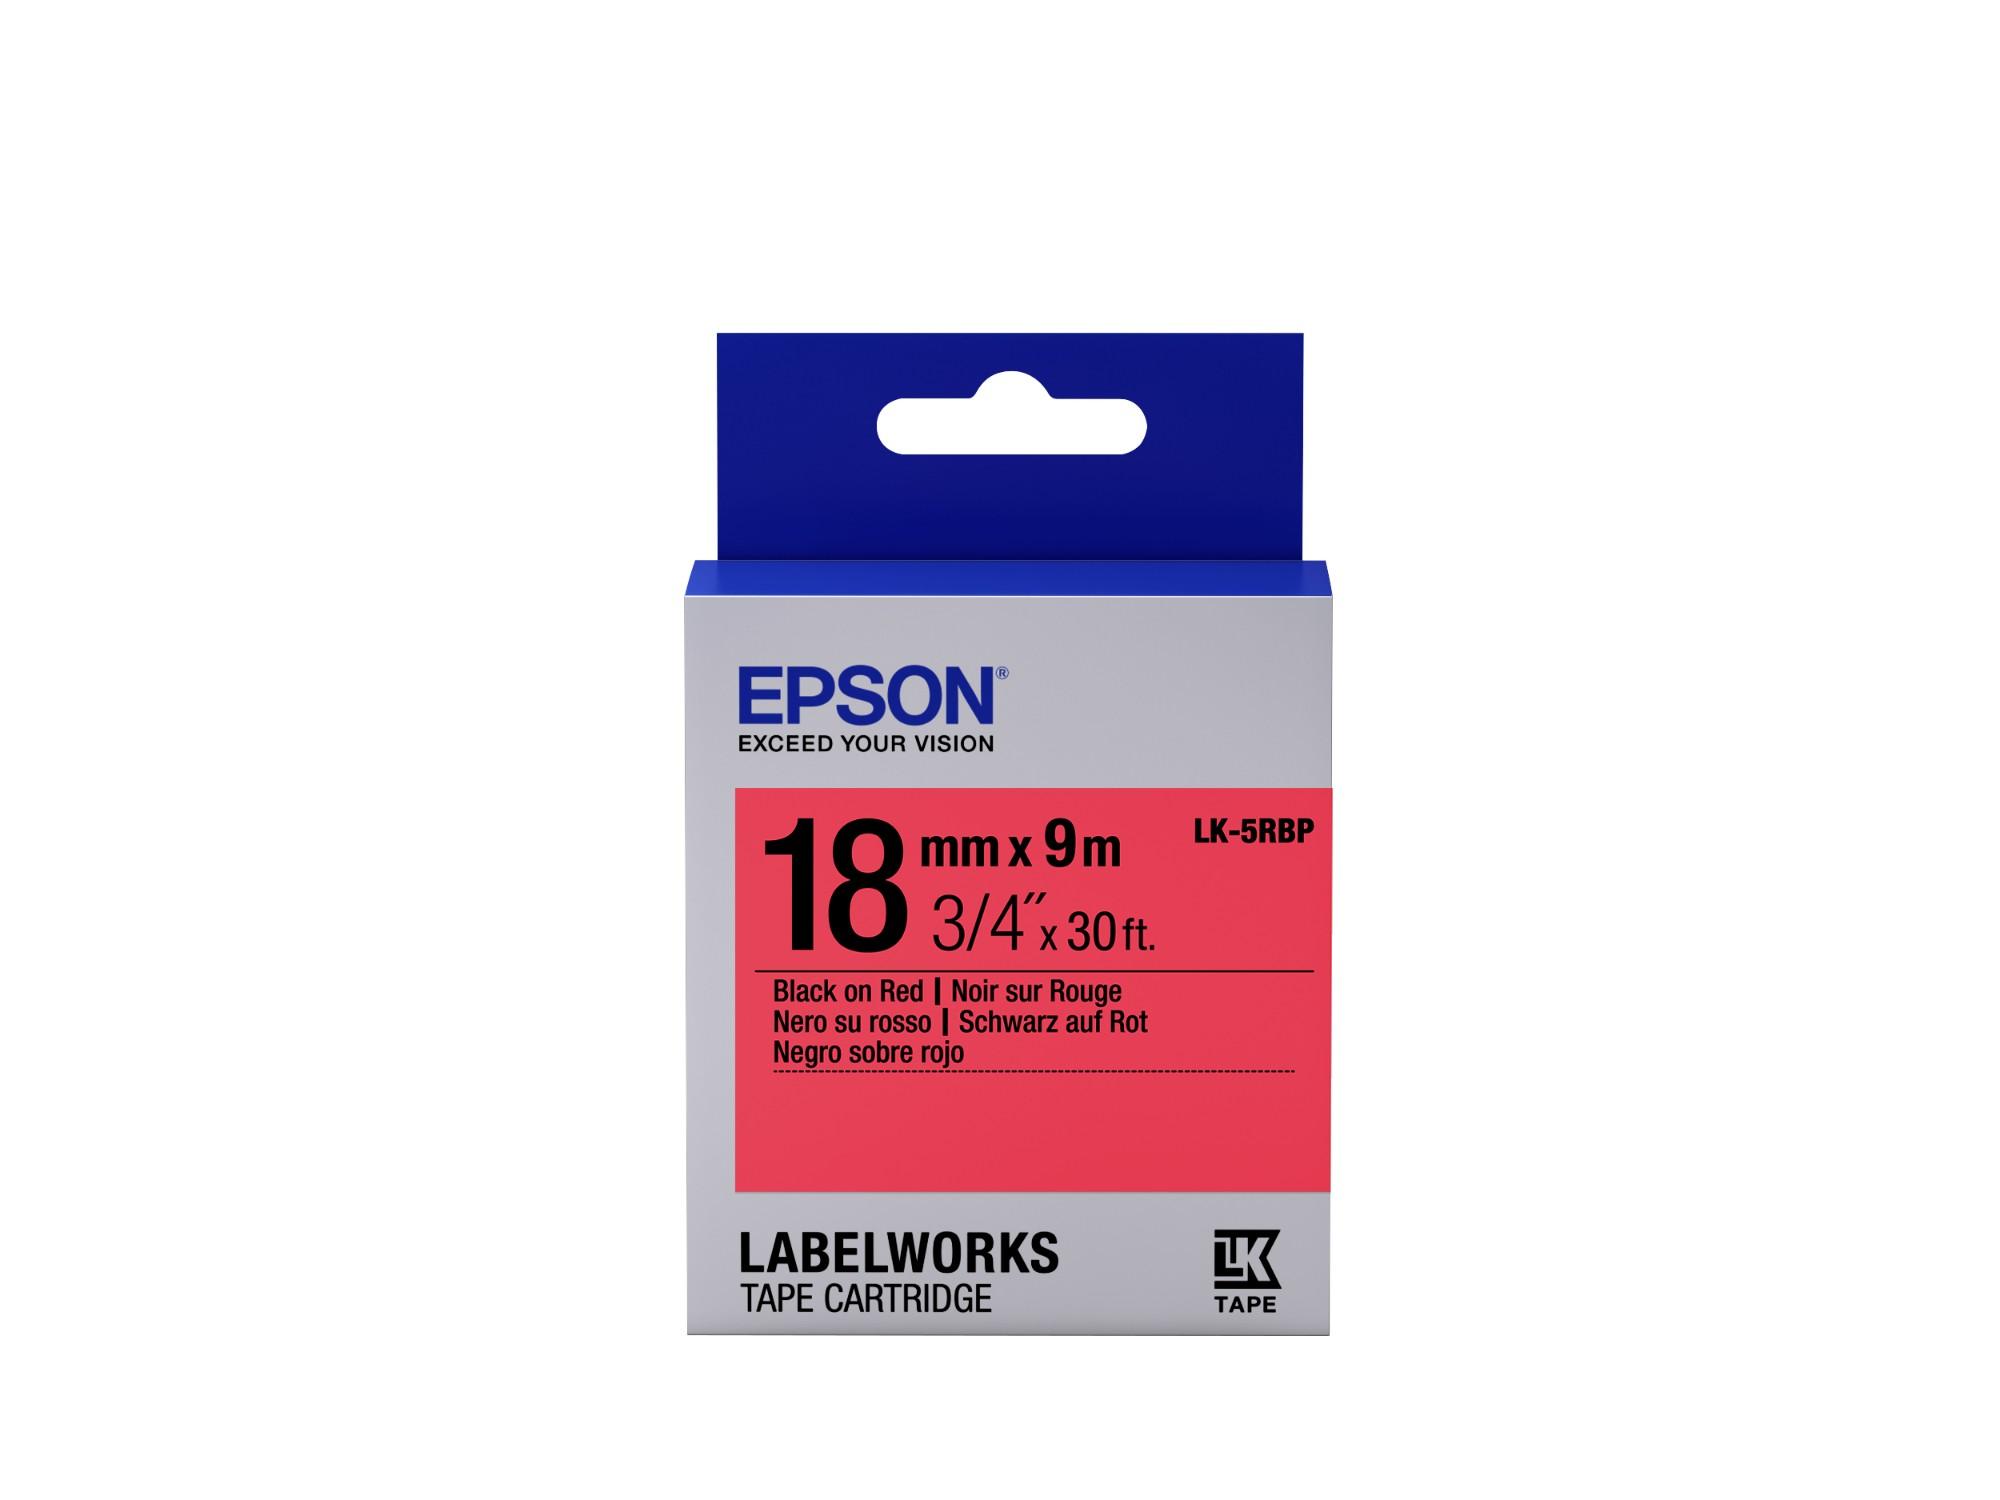 Epson C53S655002 (LK-5RBP) Ribbon, 18mm x 1,5m